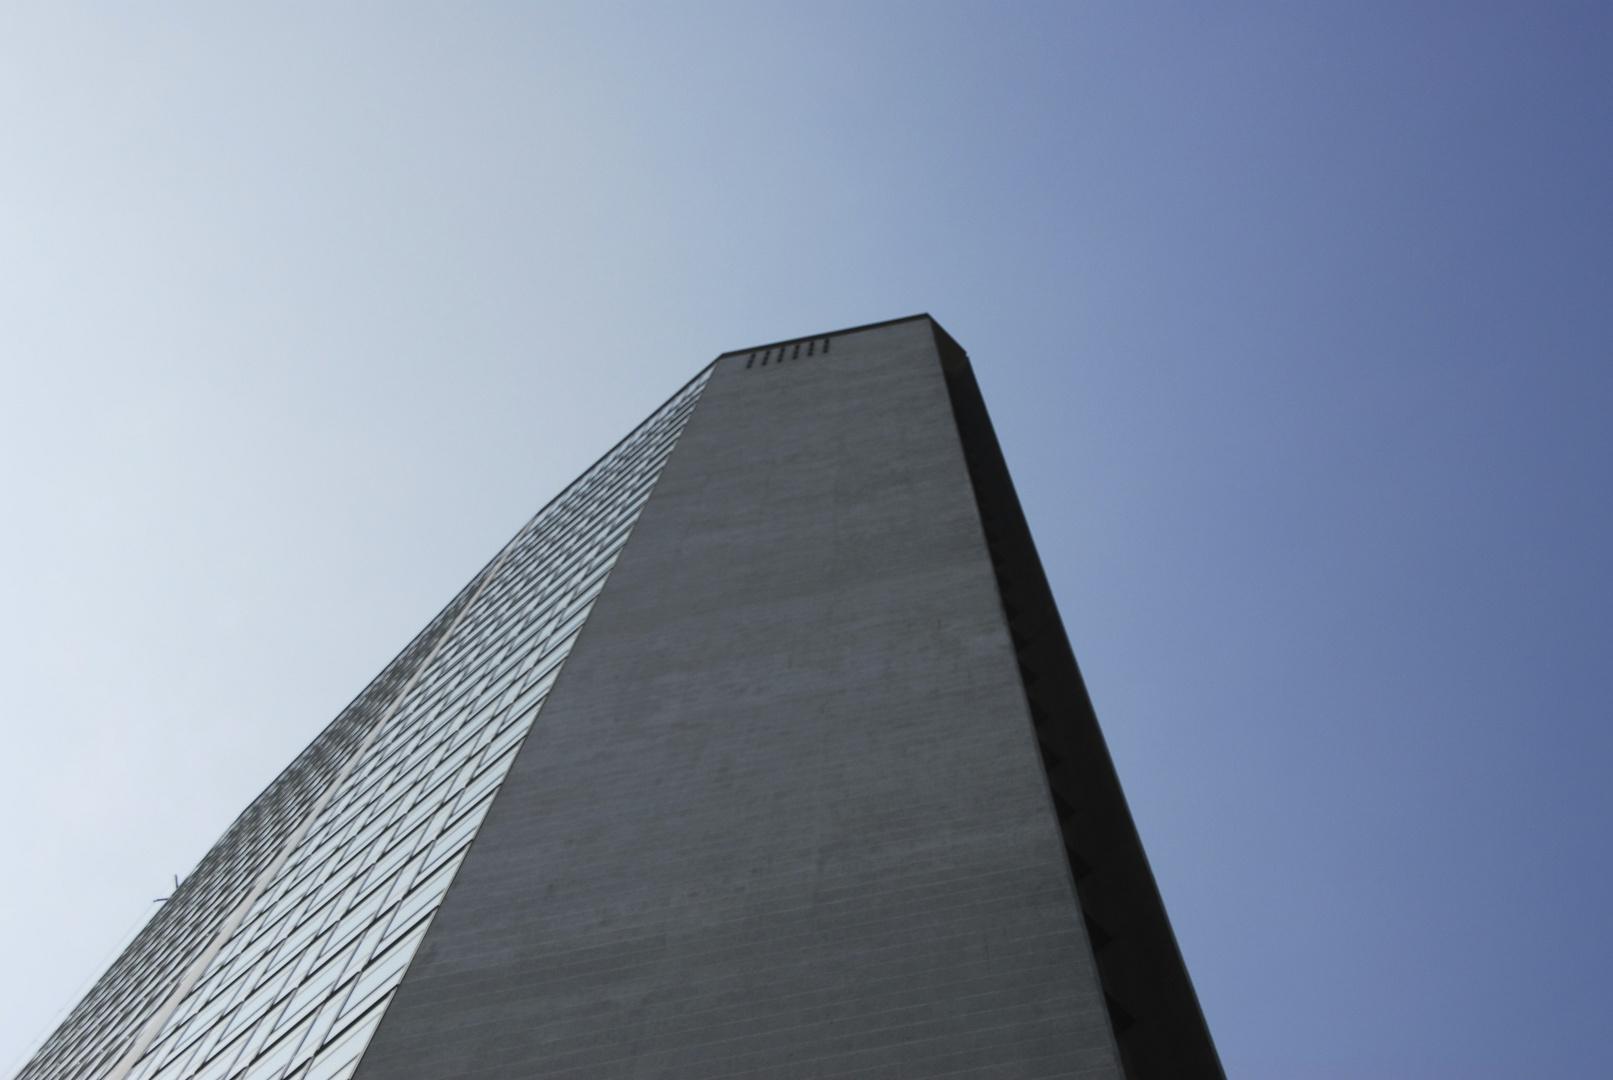 Pirelli building, Milano